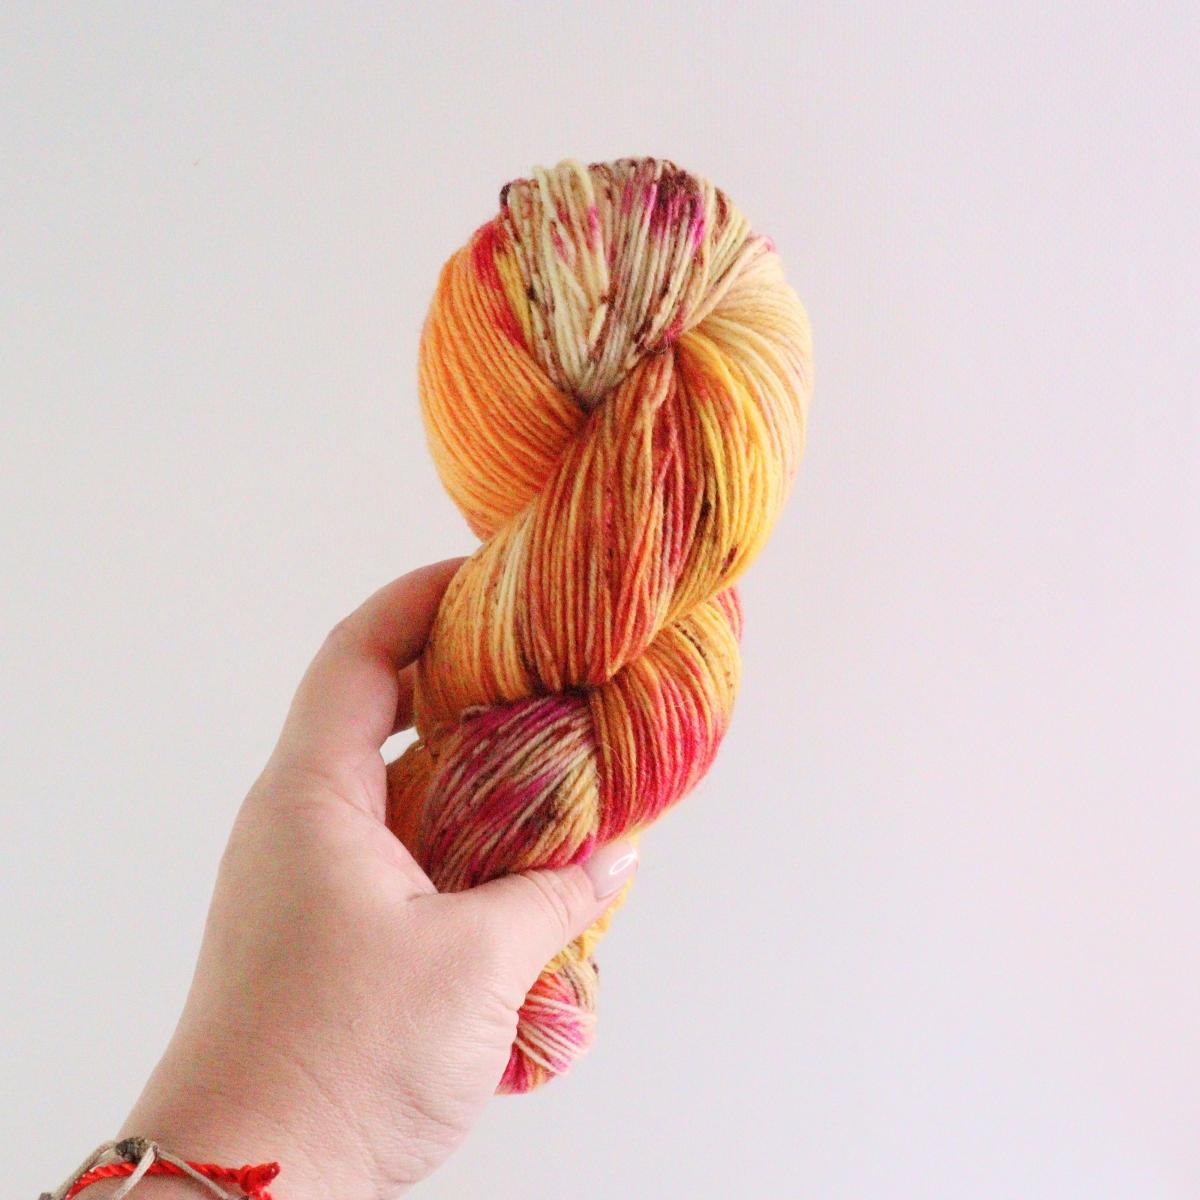 woodico.pro hand dyed yarn 071 4 1200x1200 - Hand dyed yarn / 071